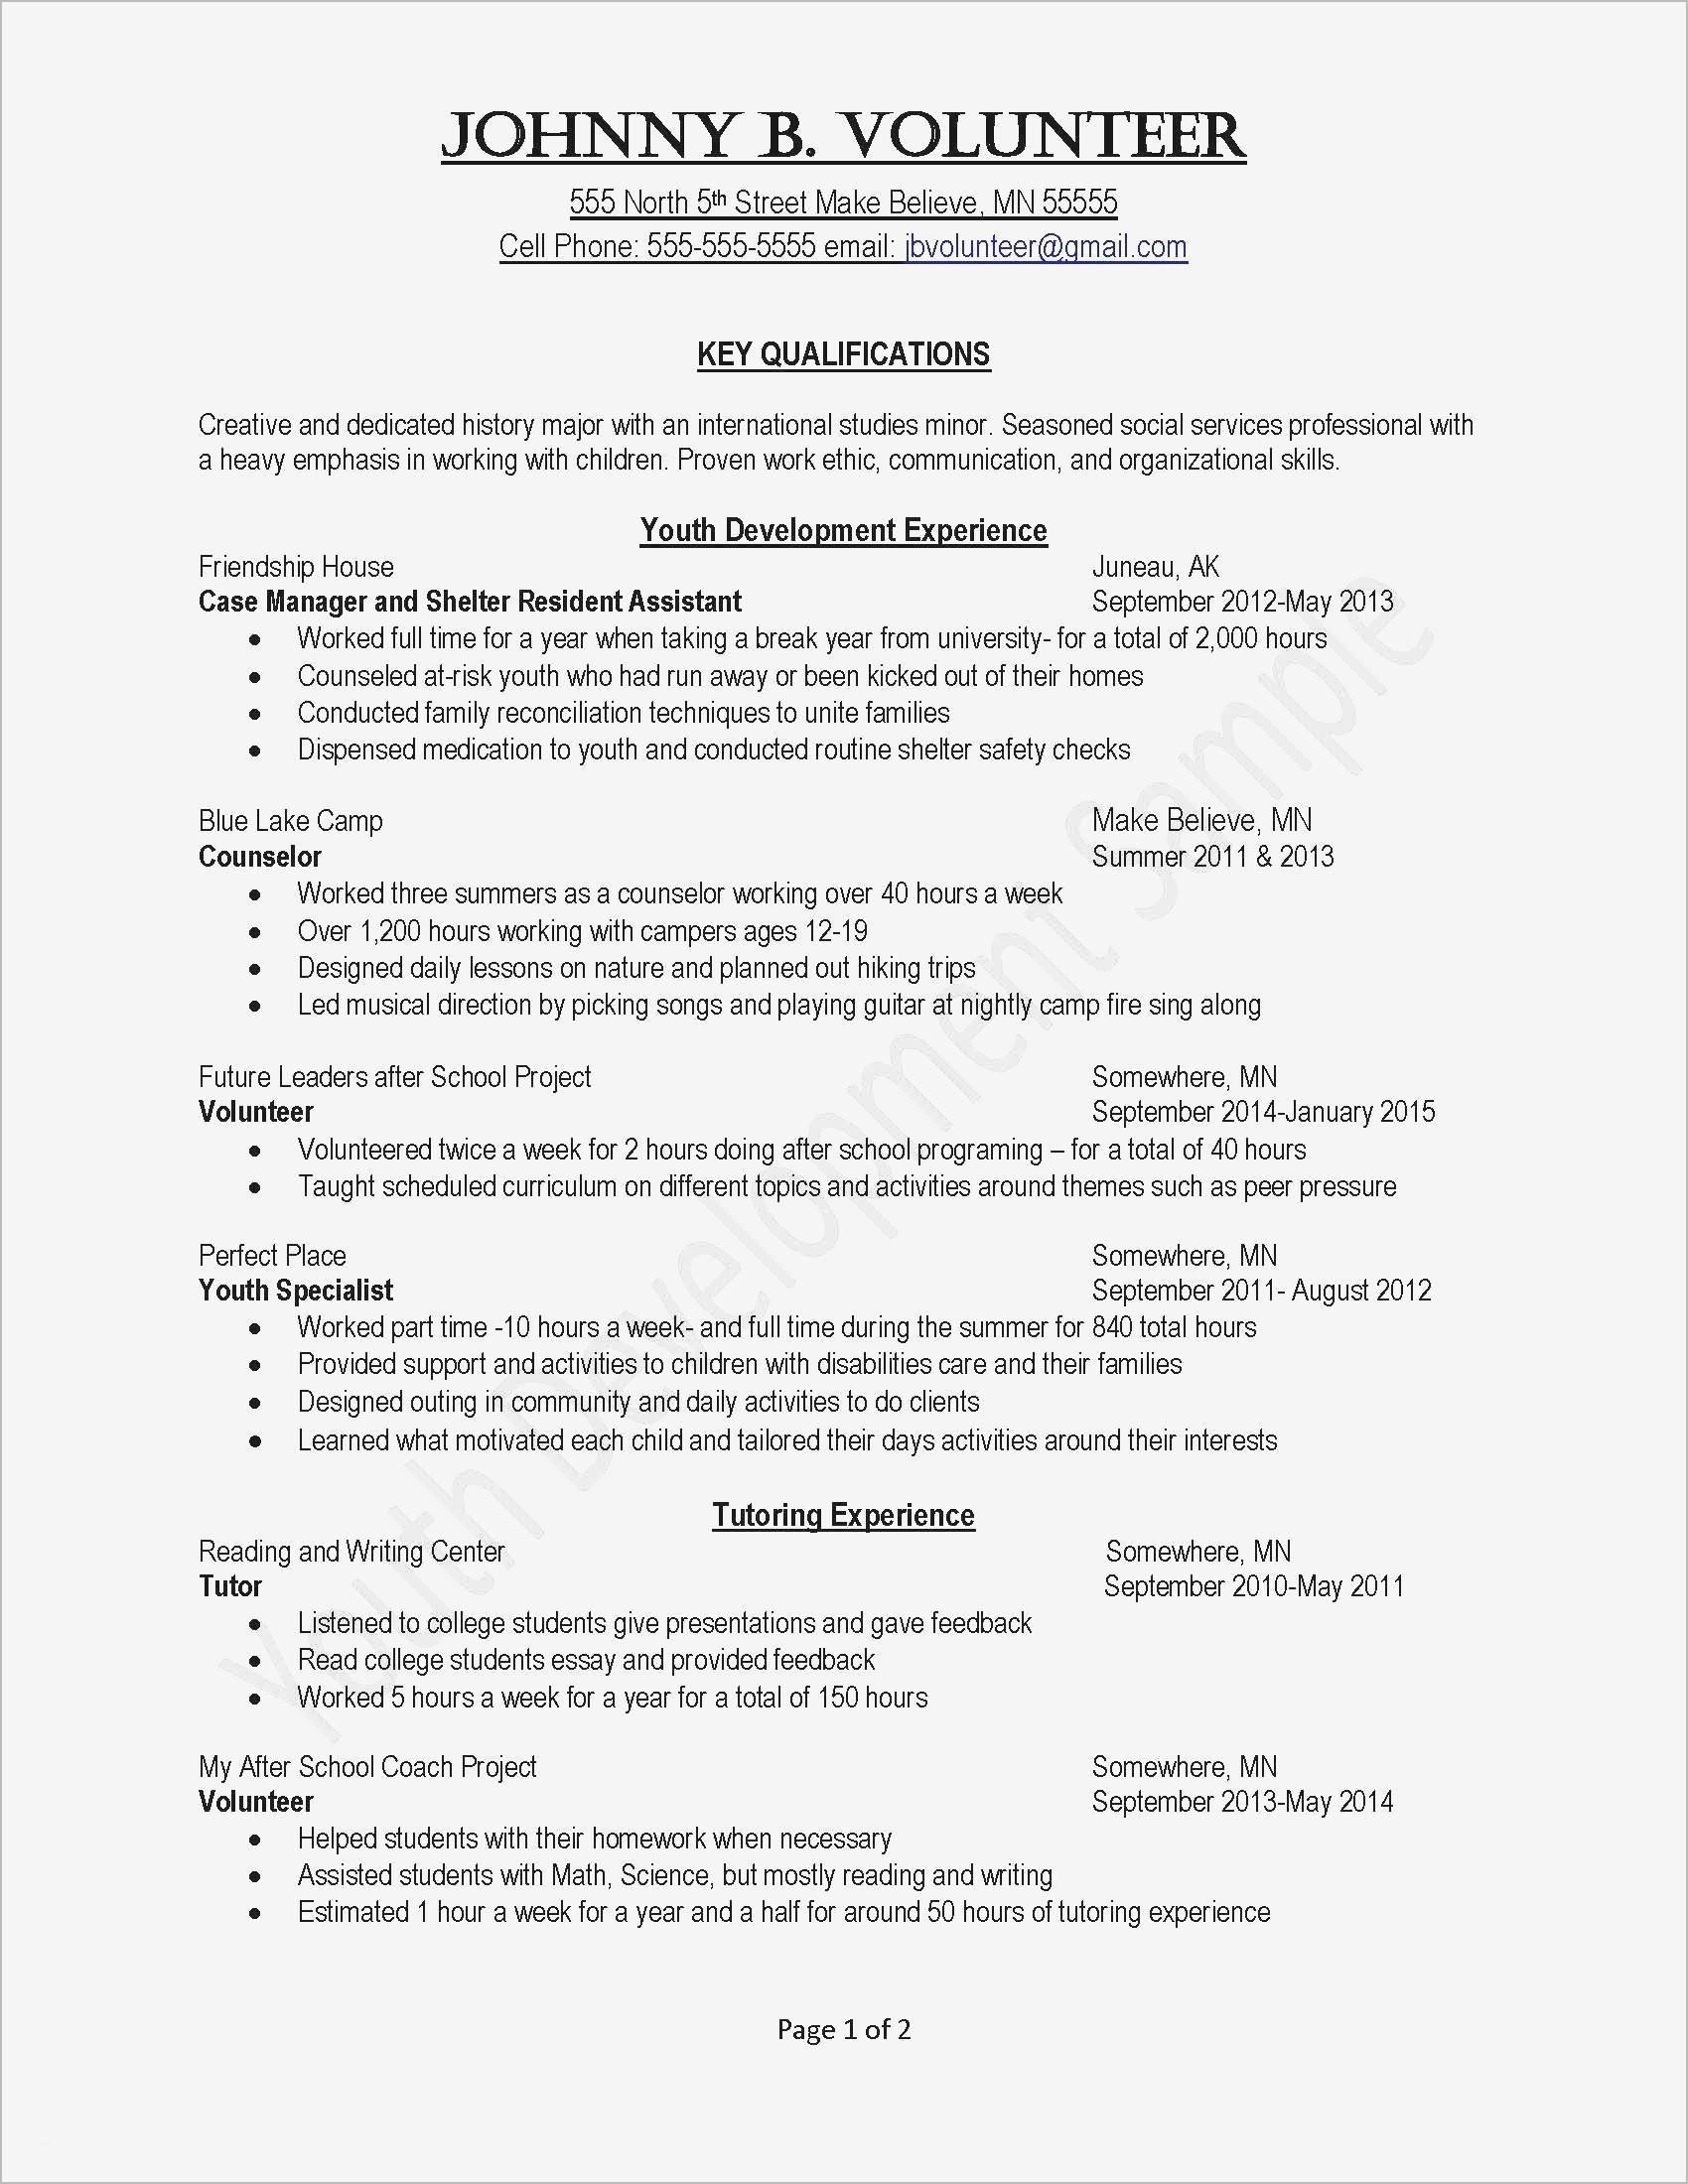 Credit Freeze Letter Template - Activities Resume Template Valid Job Fer Letter Template Us Copy Od